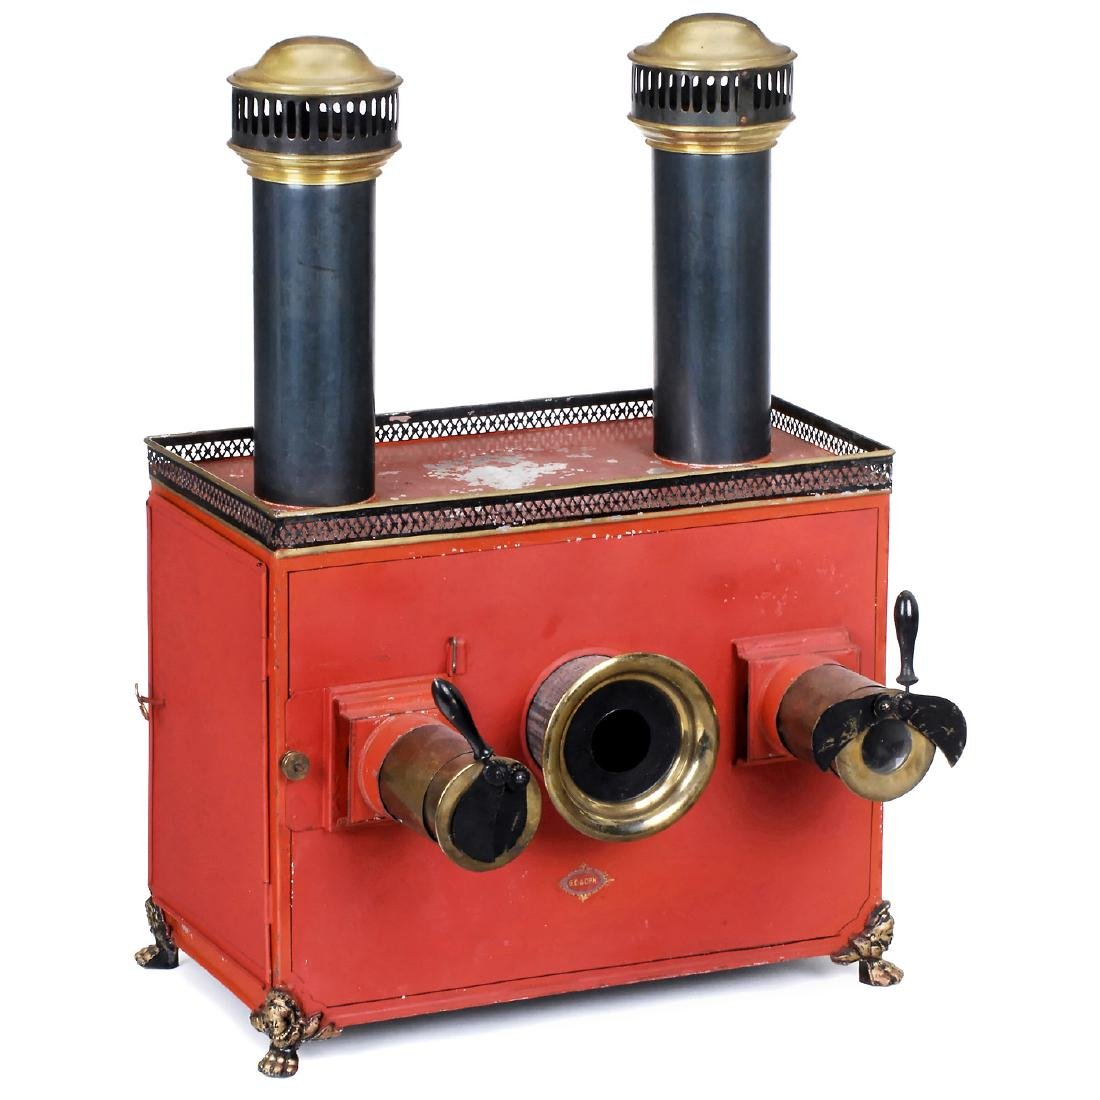 Megascope (Dissolving-View Lantern) by Carette, c. 1900